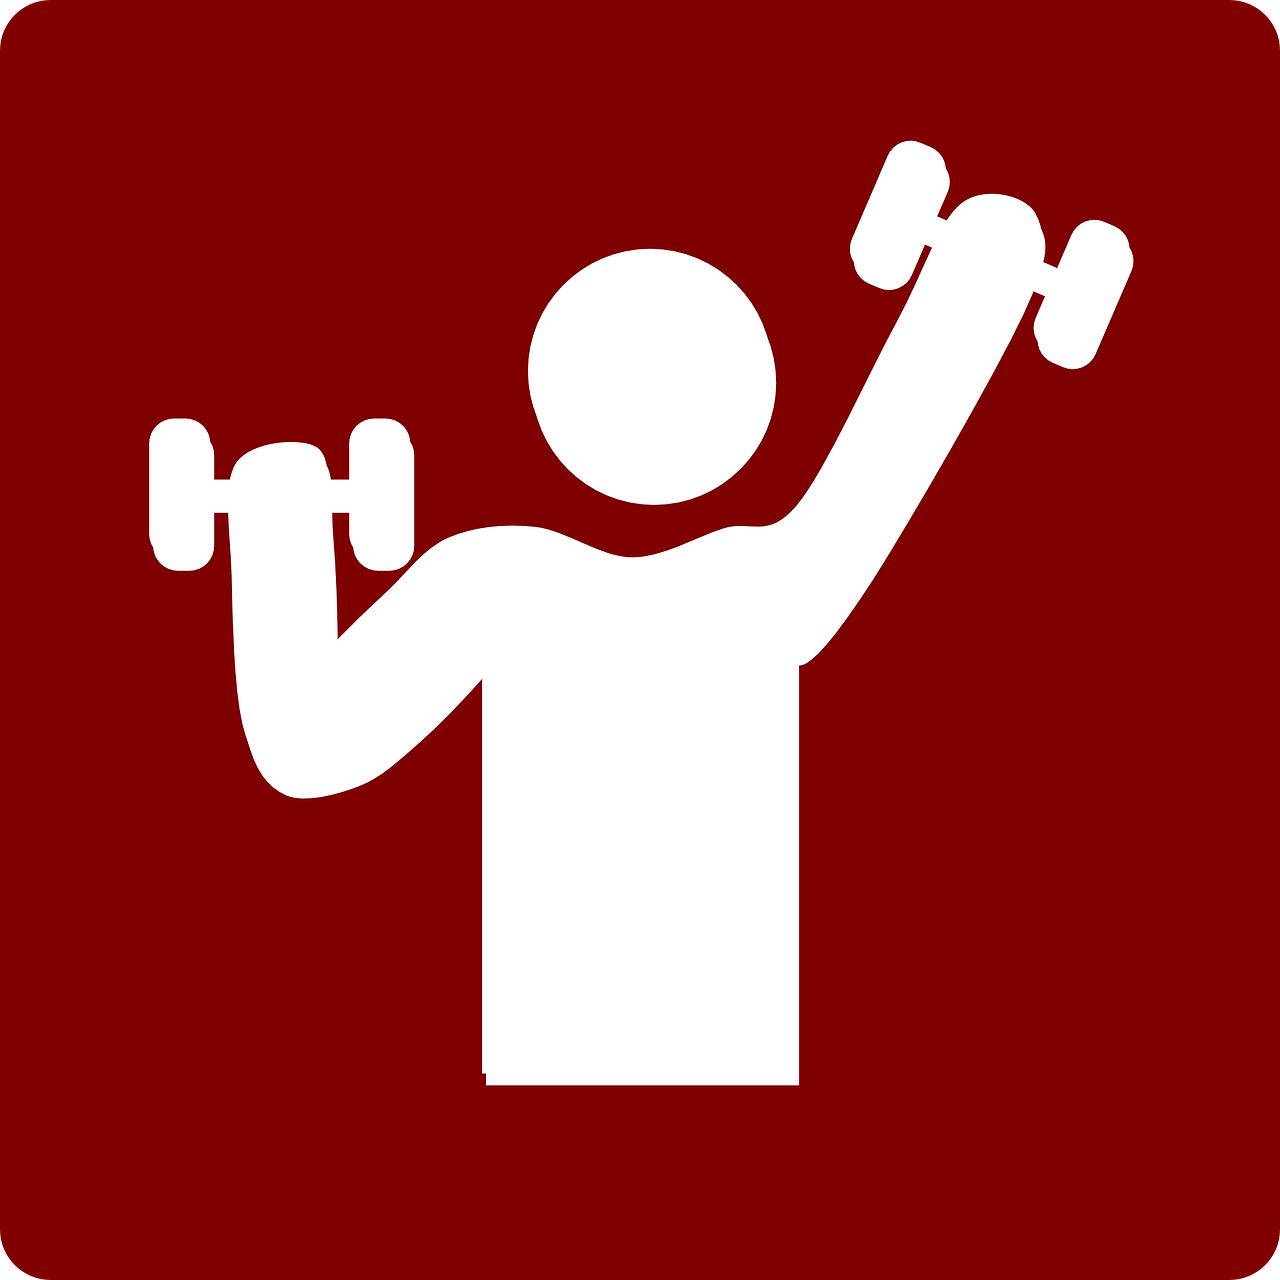 Weight lifting logo